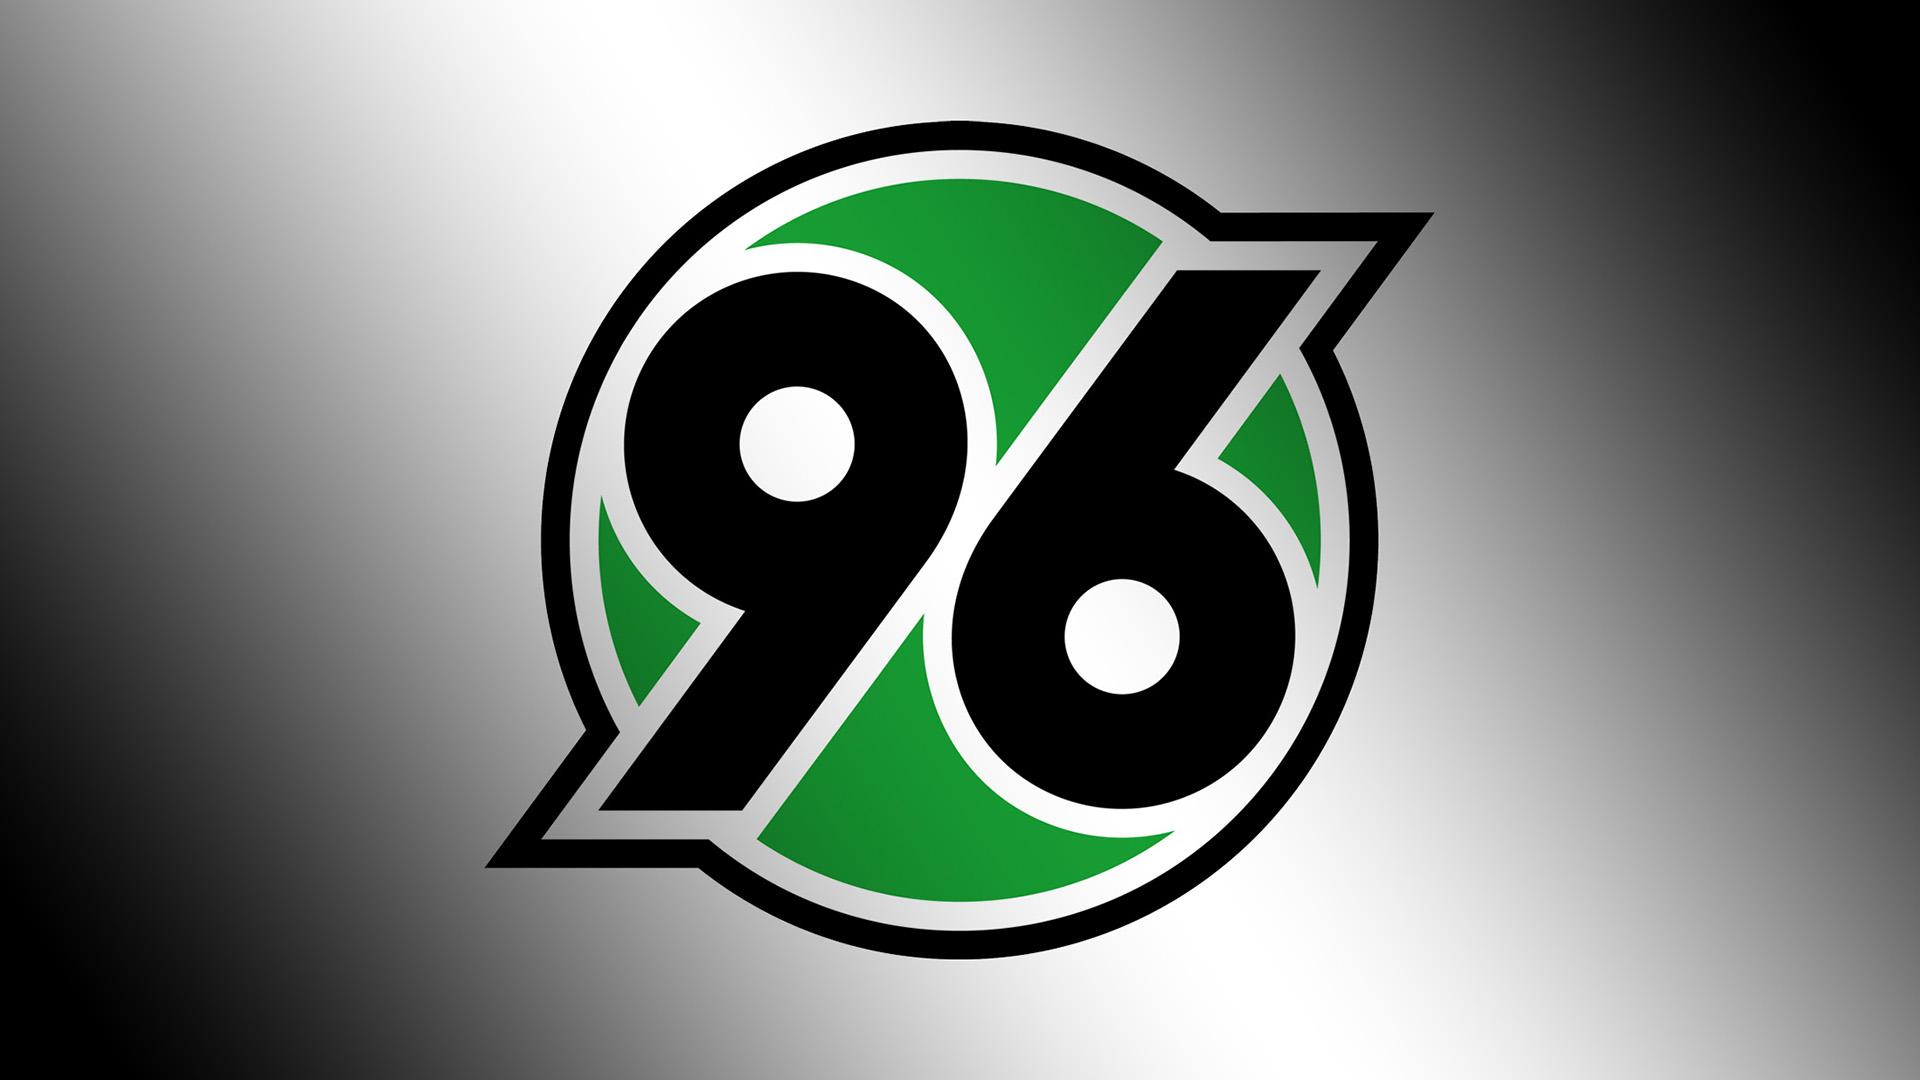 hanover96